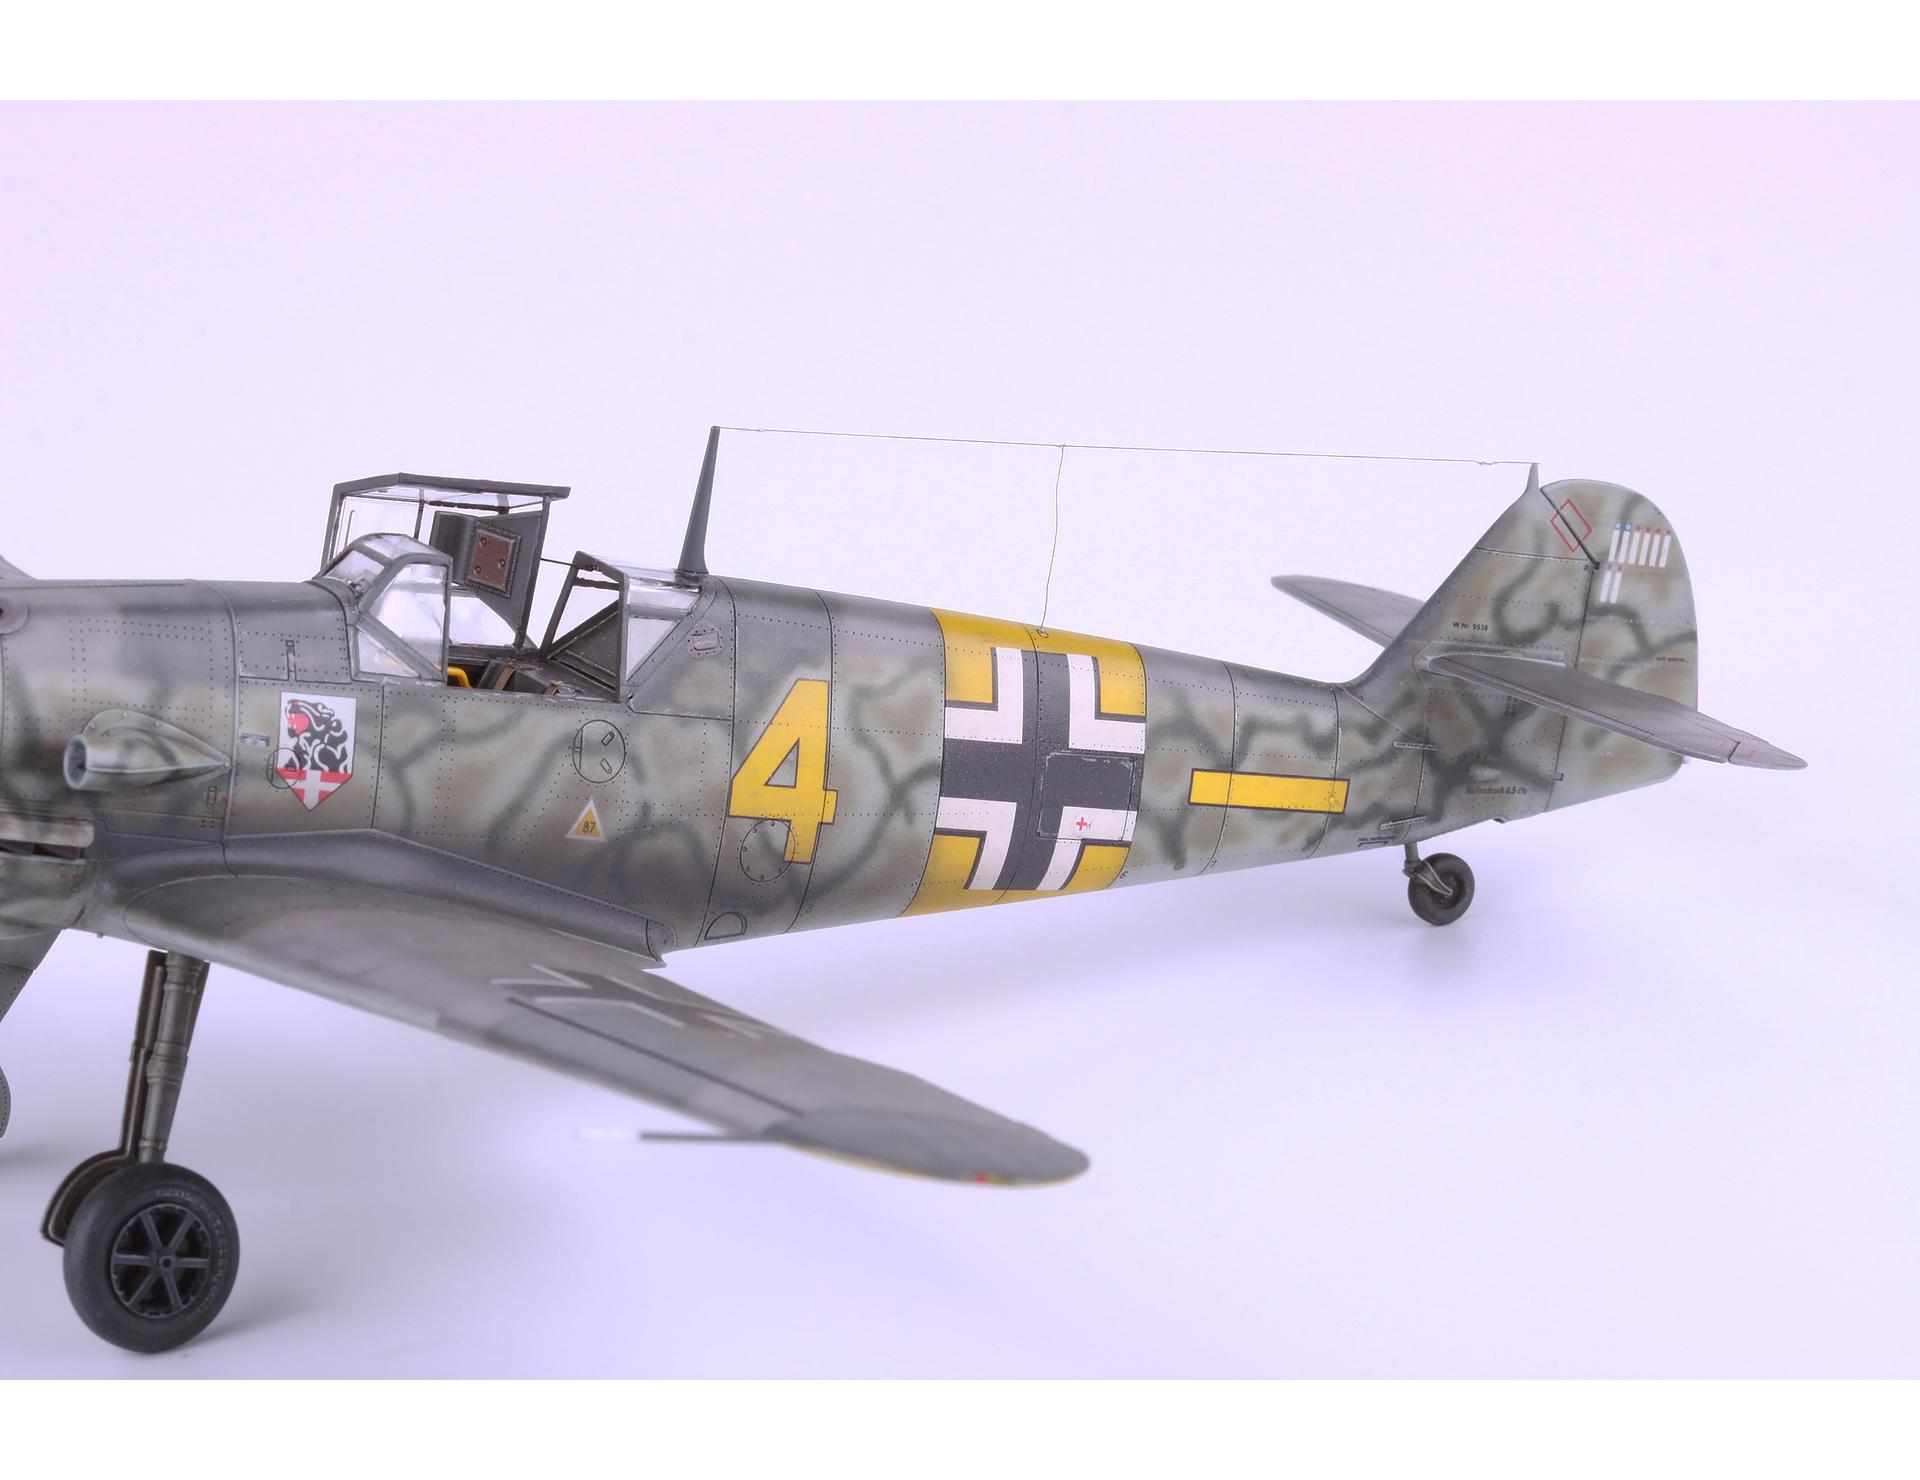 Neu Ätzsatz Eduard Accessories Ss262-1:72 Bf 109F-2//F-4